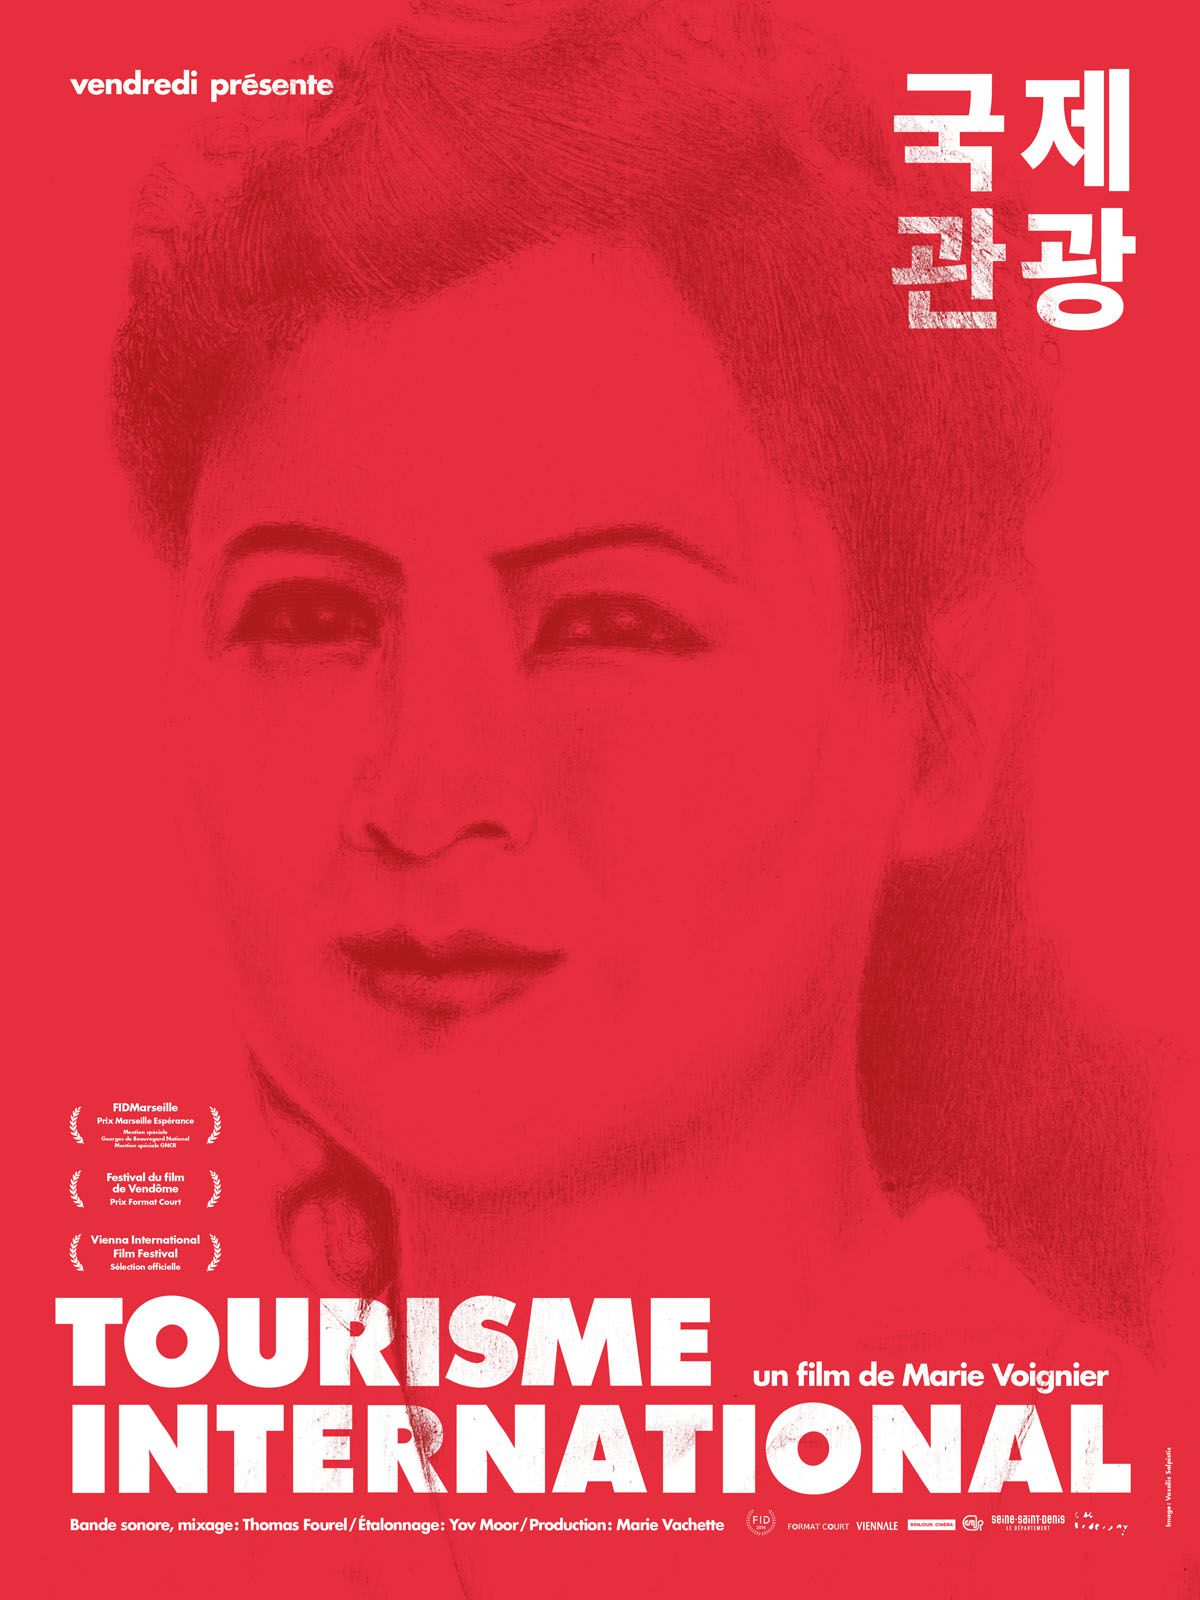 Tourisme international - Documentaire (2014)